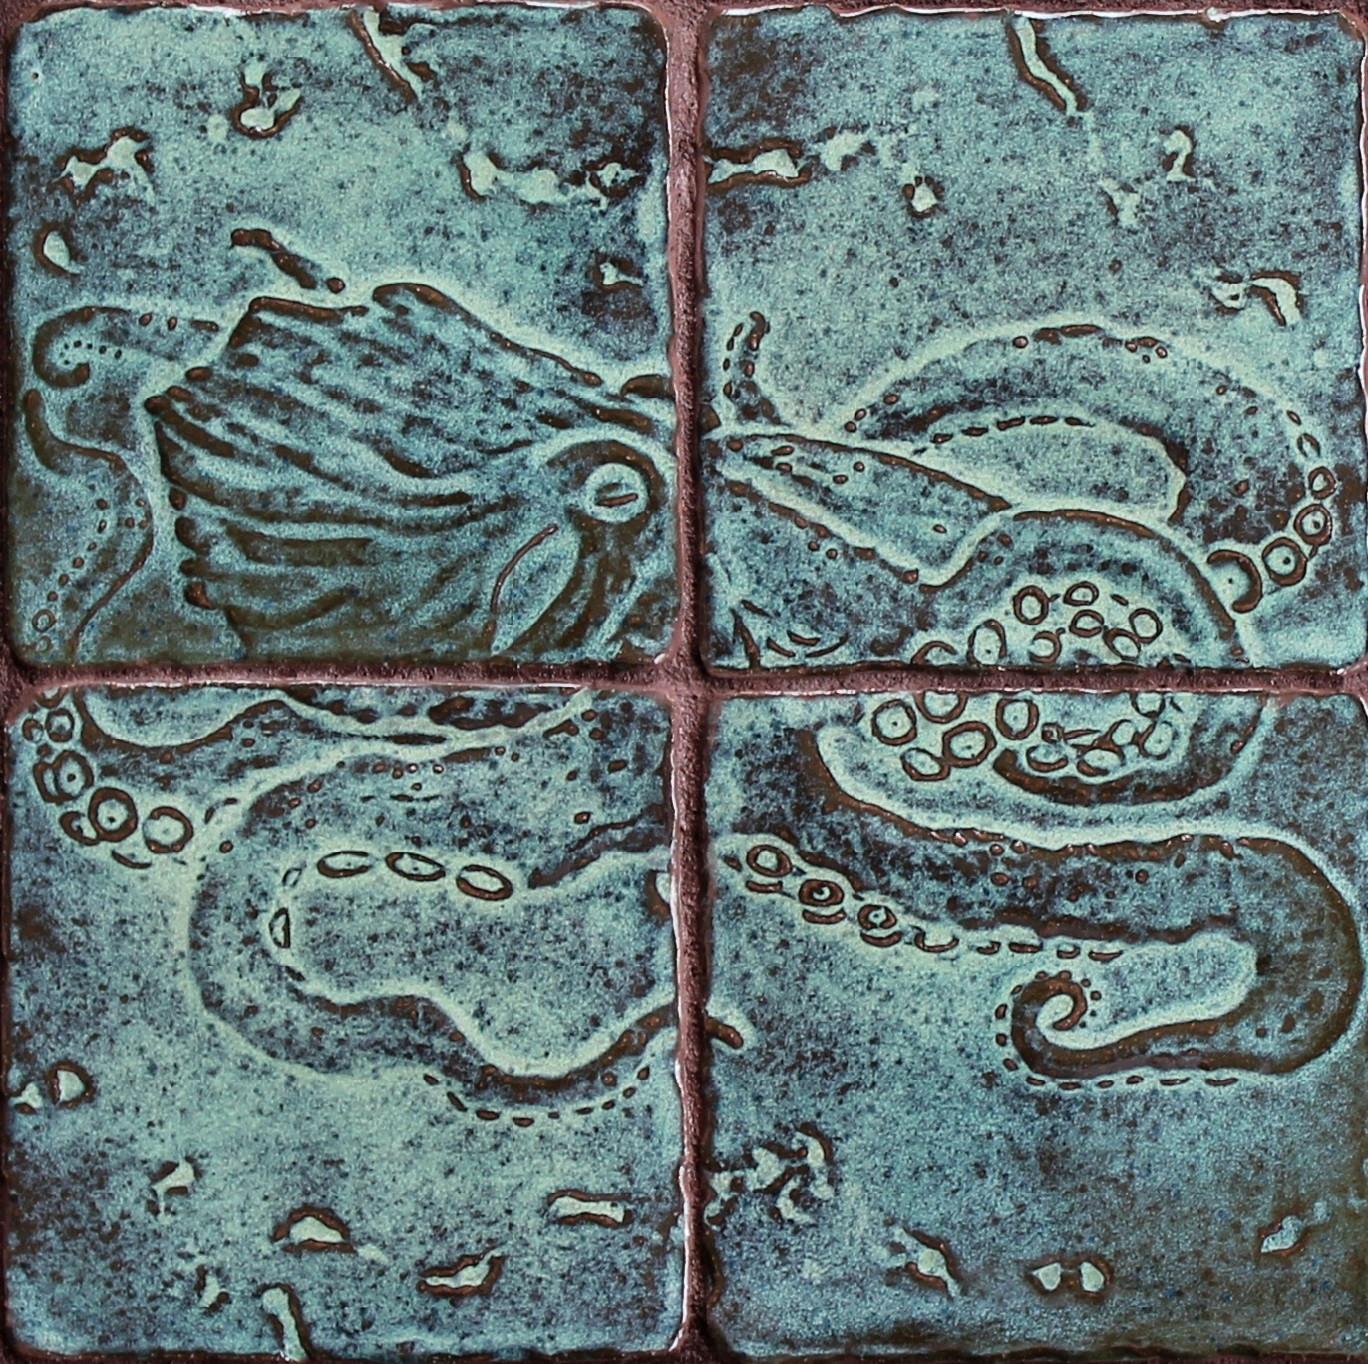 Custom handmade ceramic tile salt creek studio handmade ceramic tiles in the form of an octopus dailygadgetfo Image collections